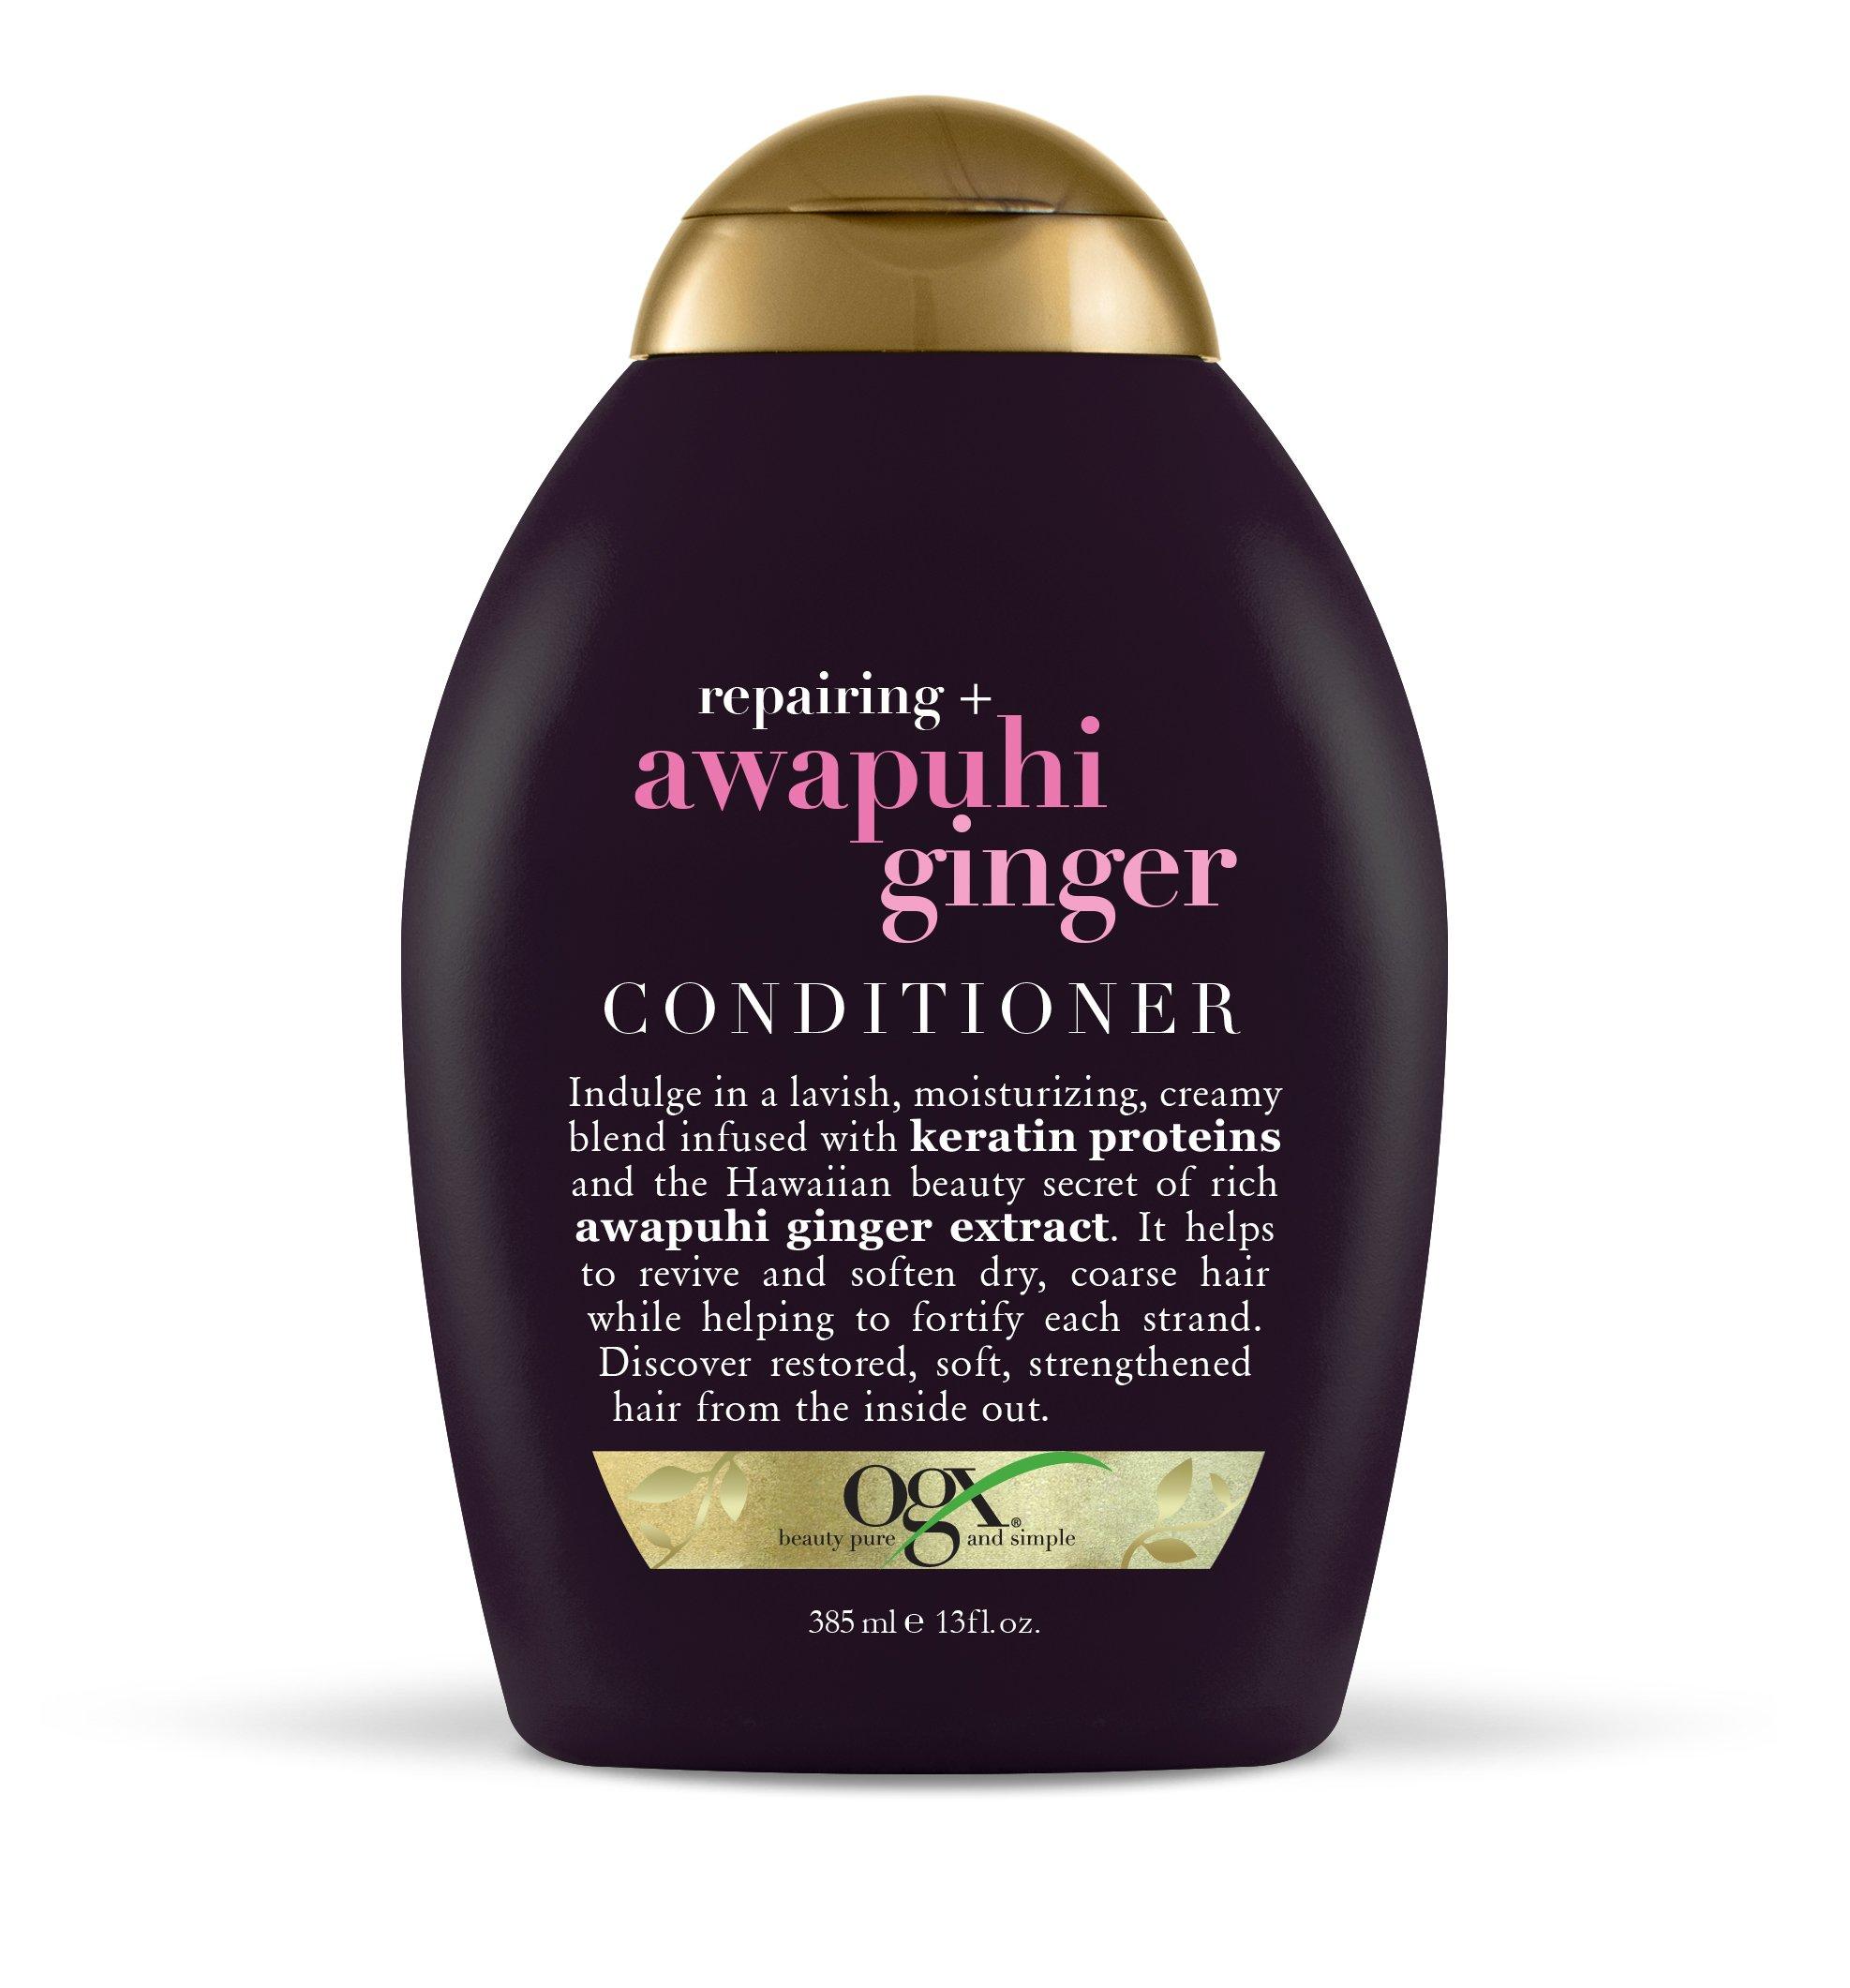 OGX OGX Reparing + Awapuhi Ginger Conditioner, 13 Ounce